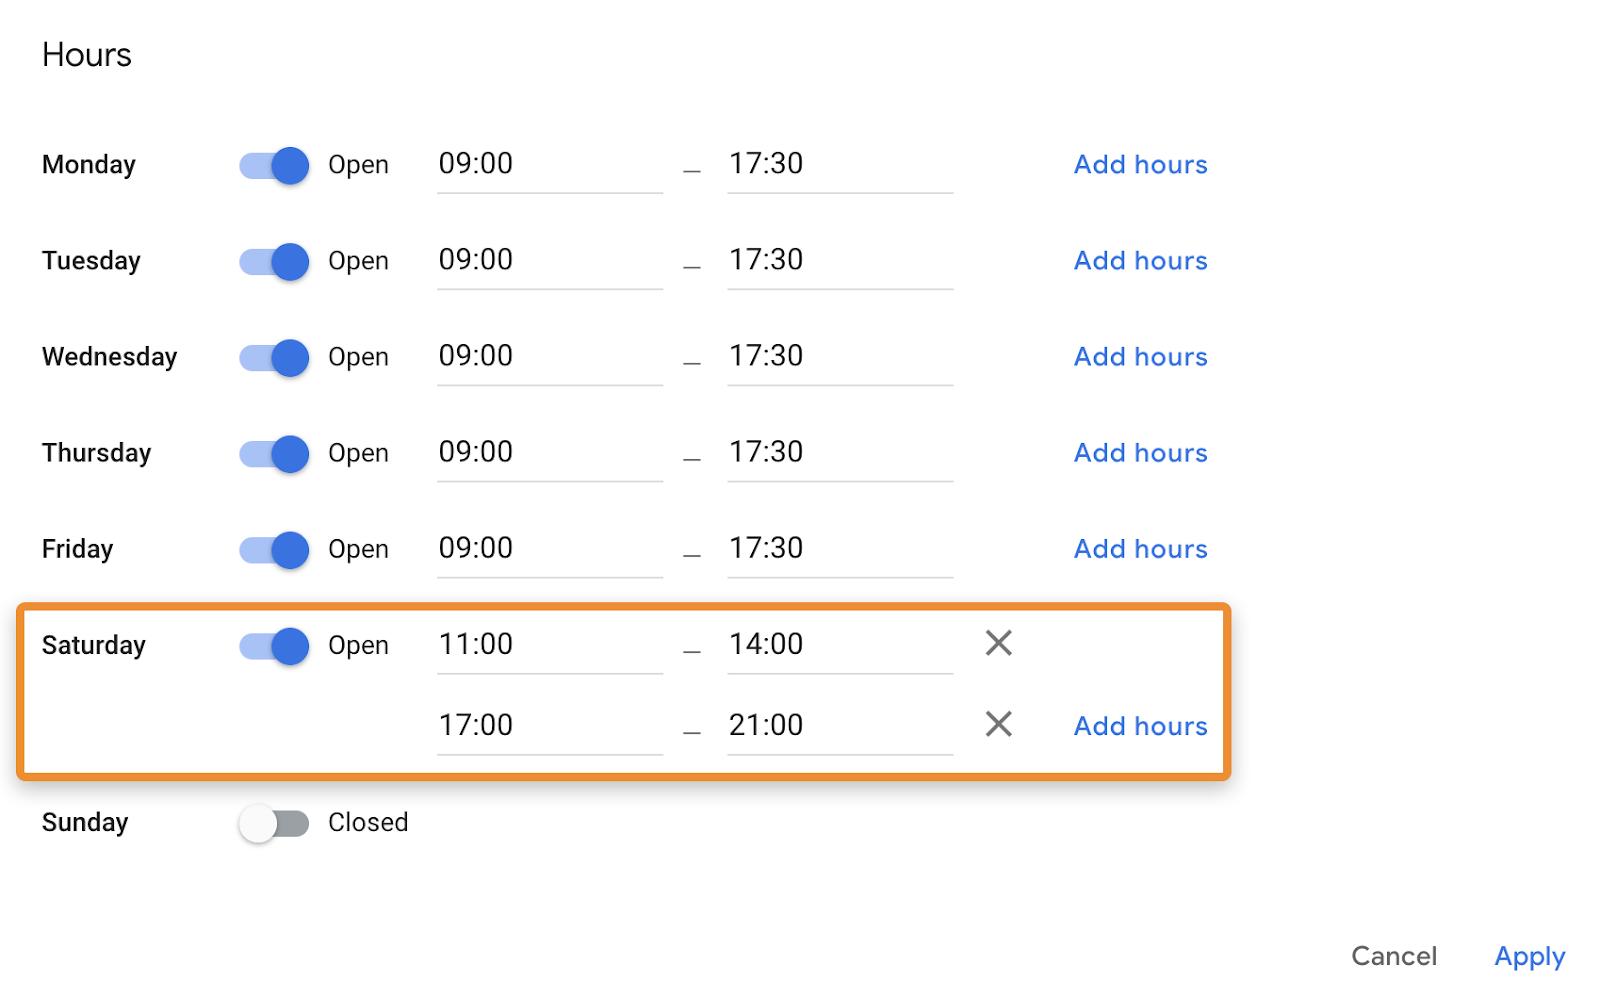 8 add hours 2